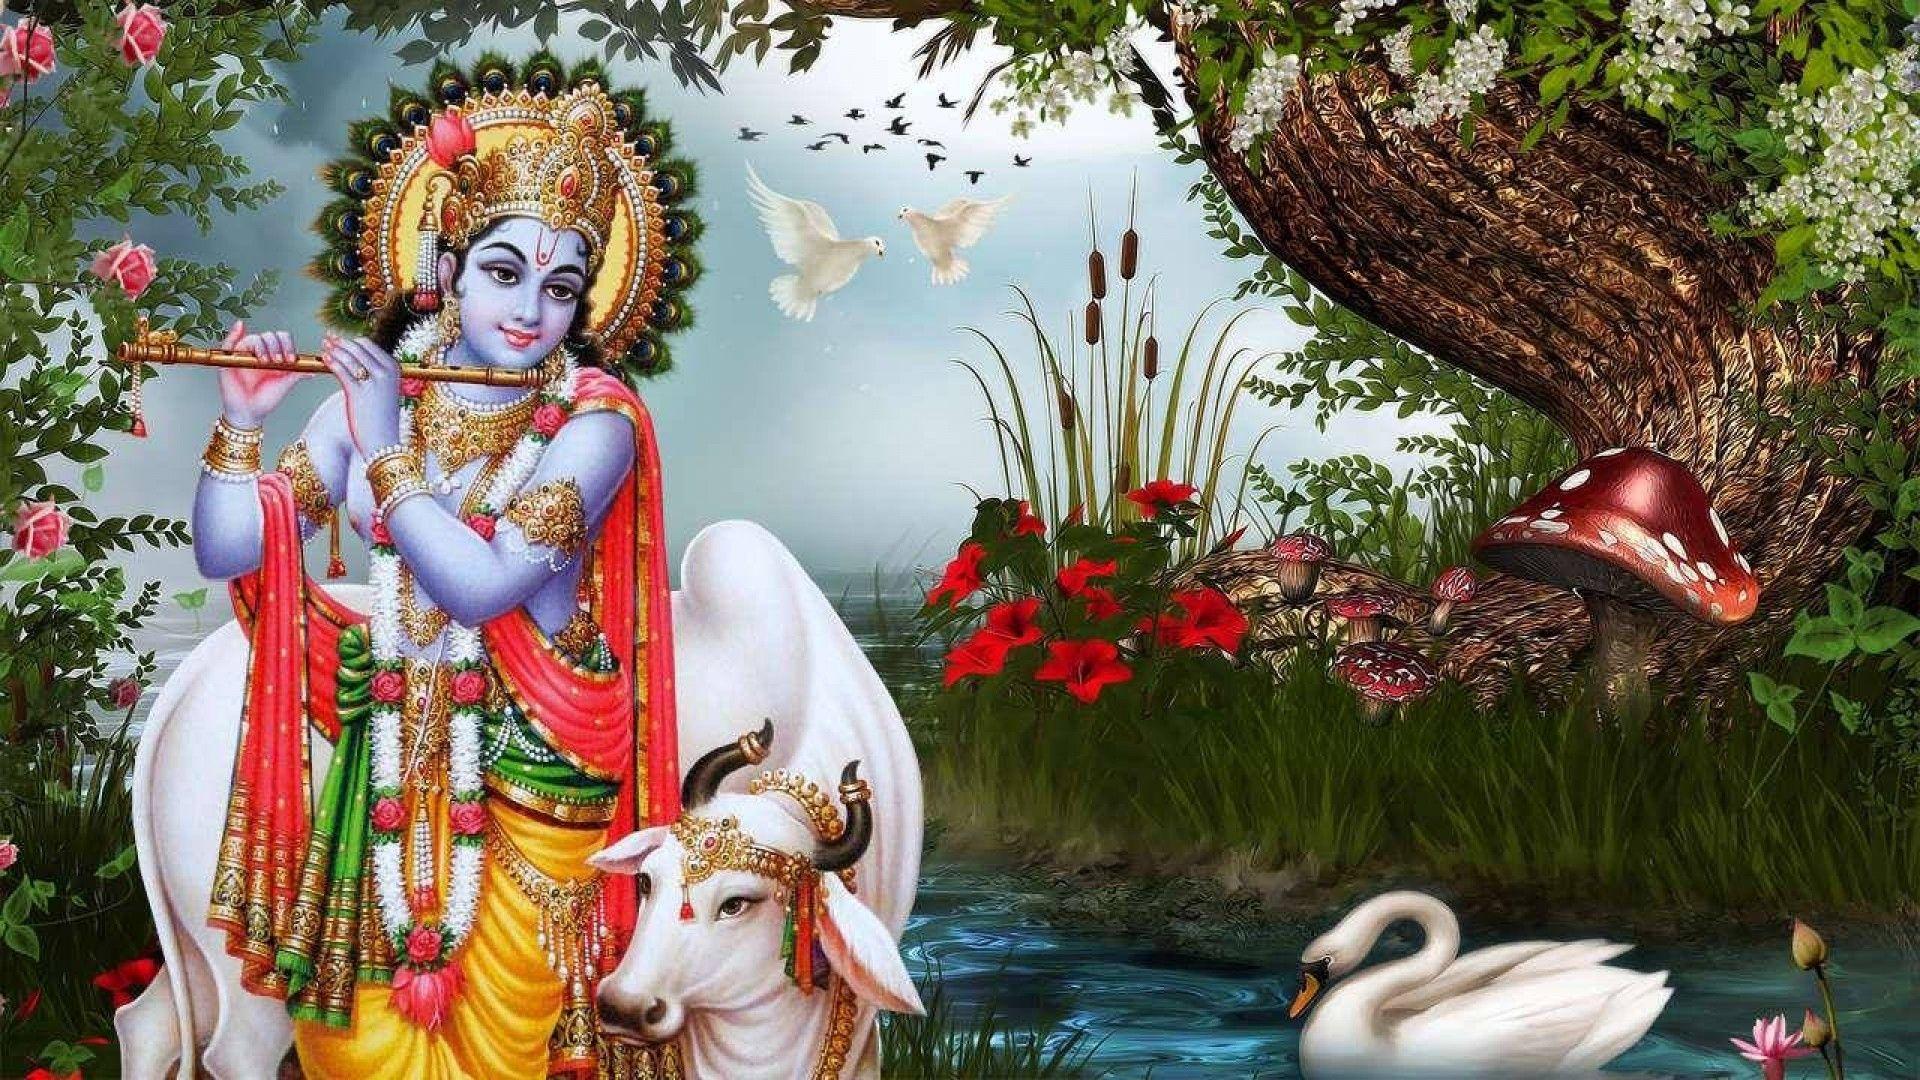 Wonderful Wallpaper Lord Radha Krishna - 2851c46c5705dc7208626a8e071d567a  Gallery_239642.jpg